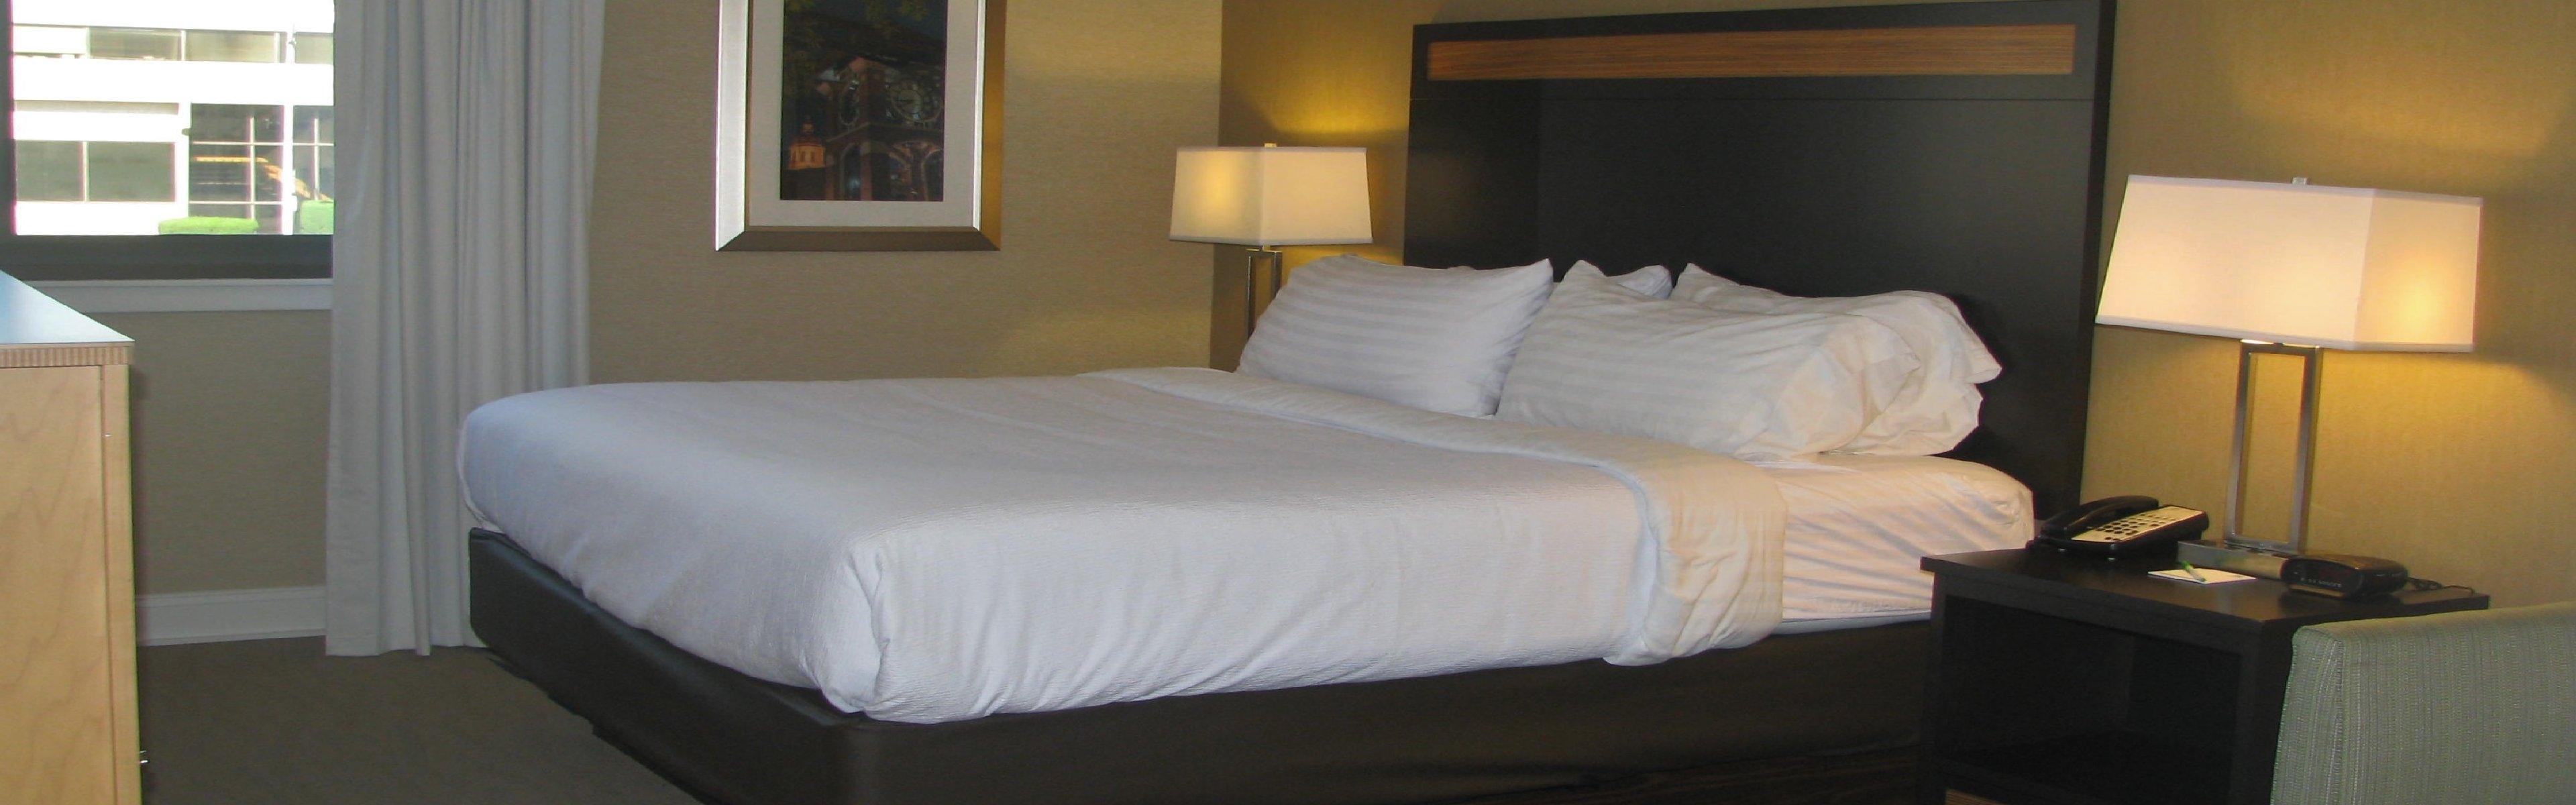 Bed Bath Beyond Concord Nh